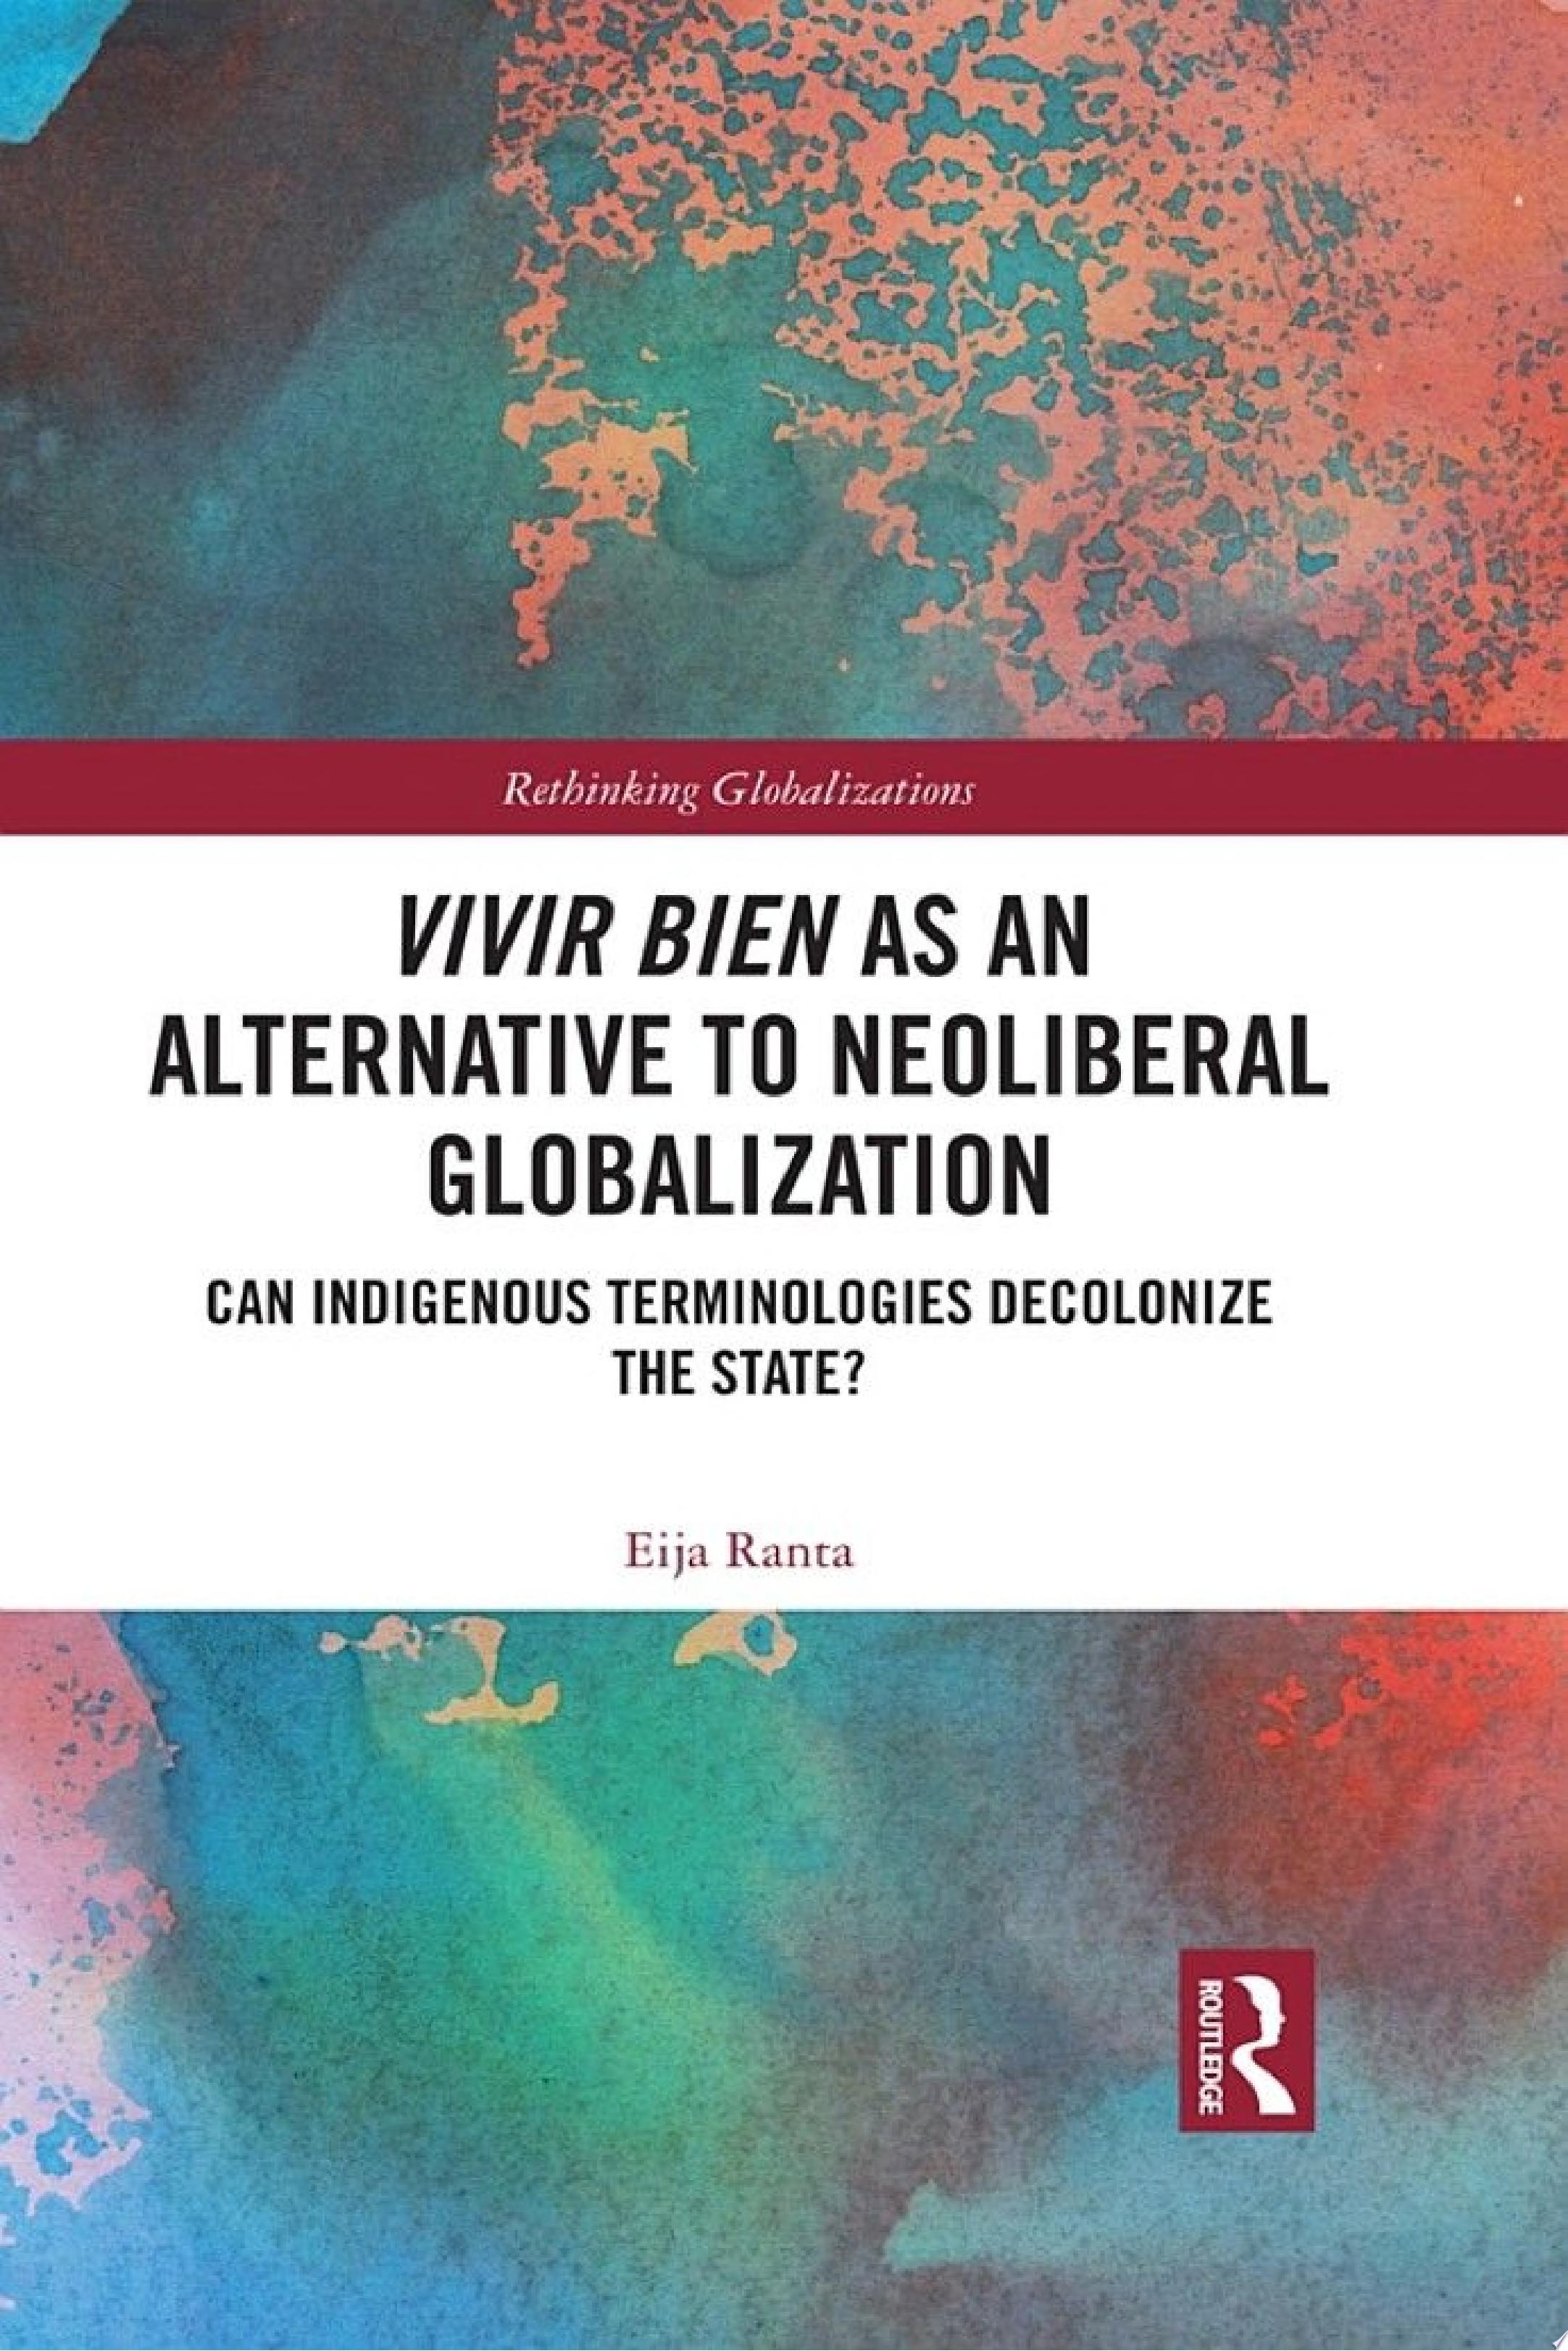 Vivir Bien as an Alternative to Neoliberal Globalization